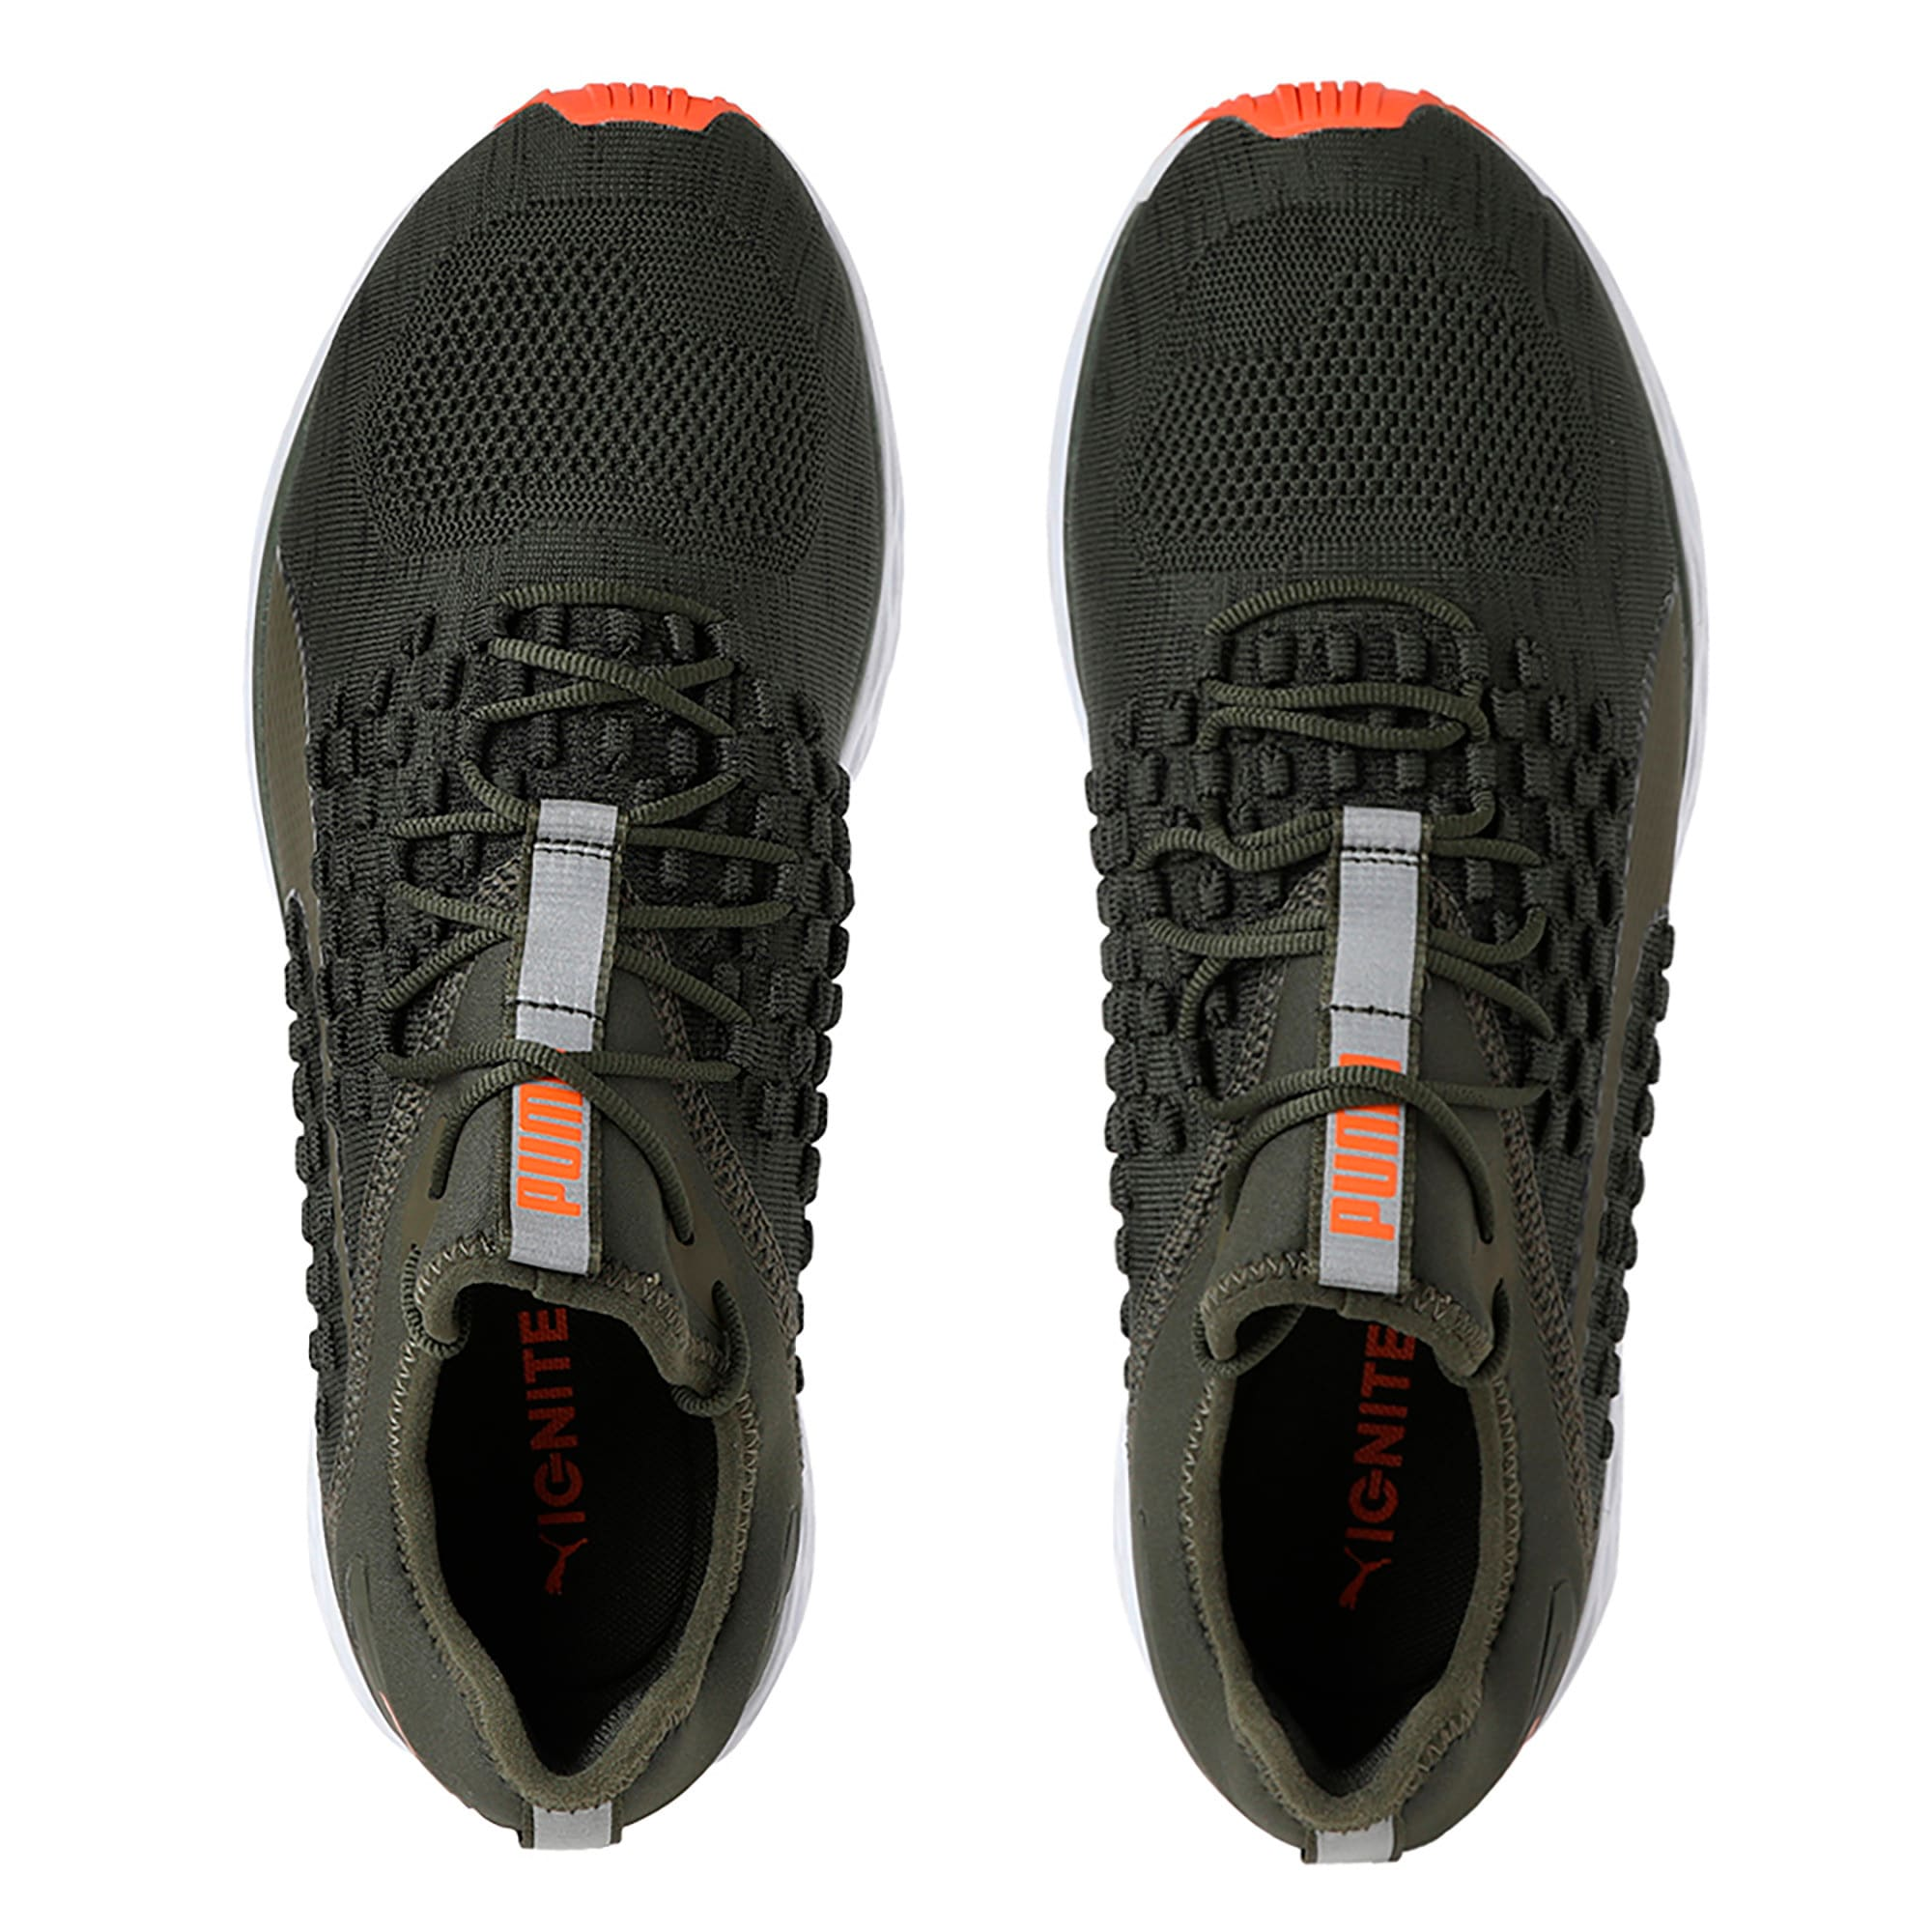 Thumbnail 4 of SPEED FUSEFIT Men's Running Shoes, Forest Night-Firecracker, medium-IND